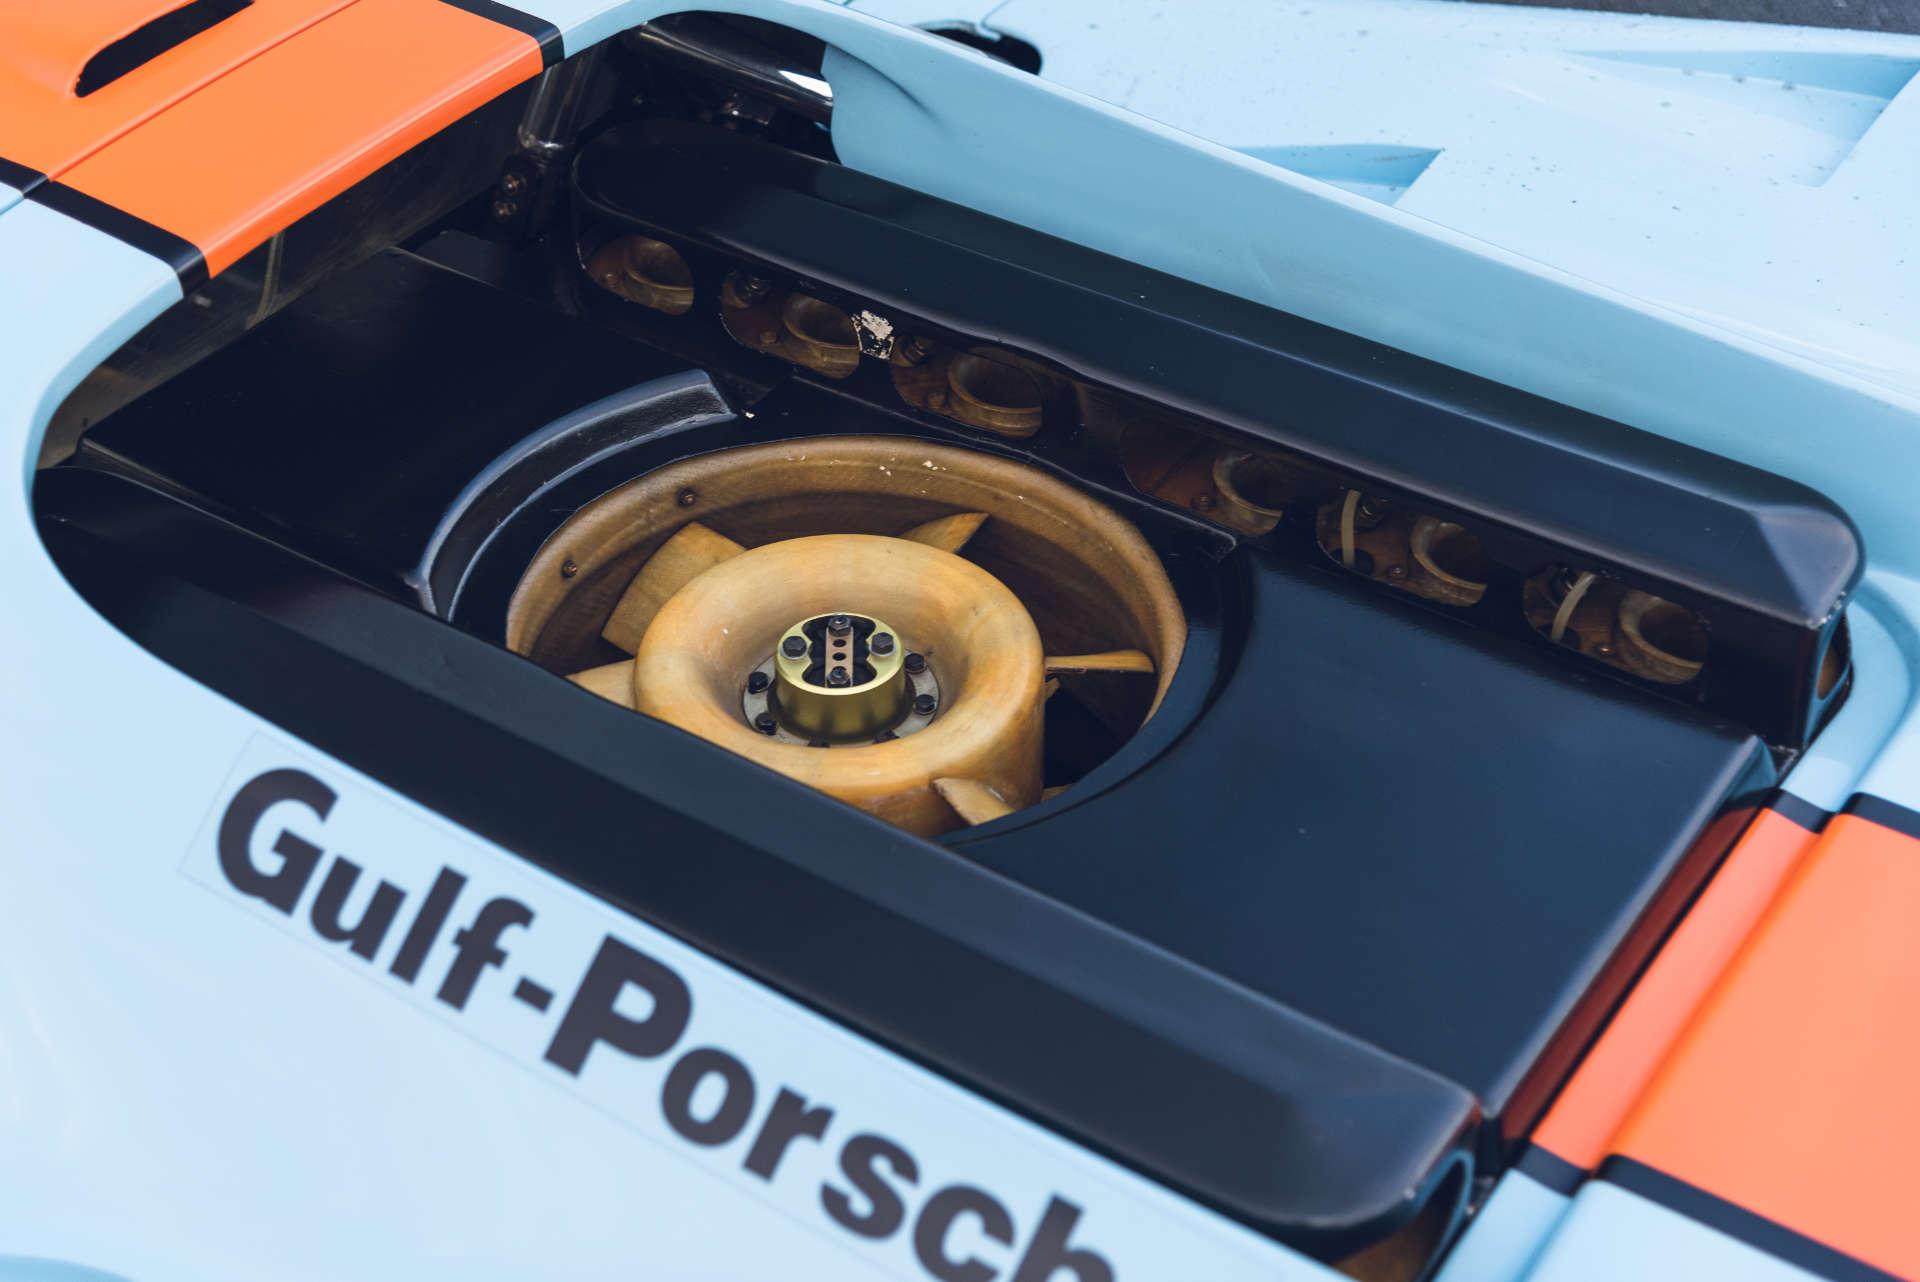 Porsche 917 Ersatzrad